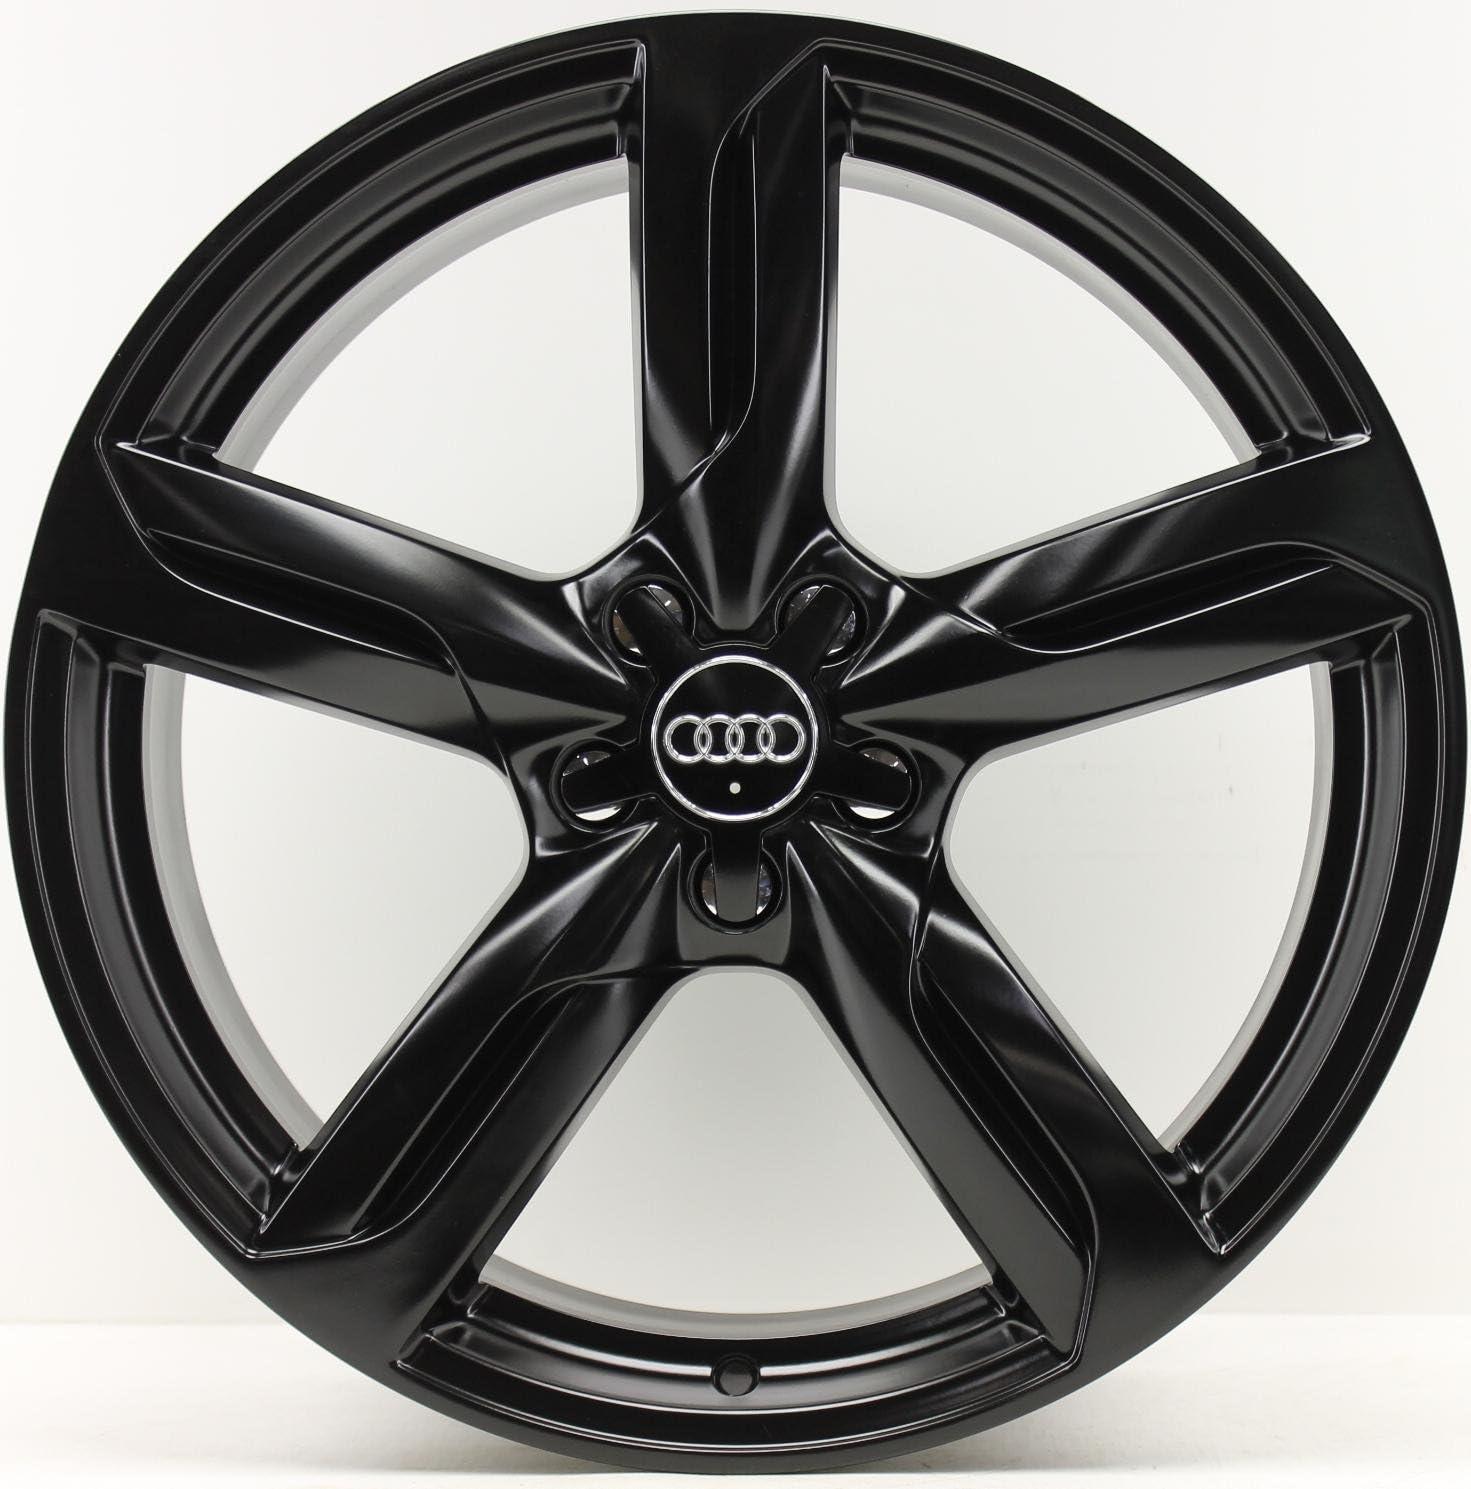 4 Original Audi Q5 SQ5 8R Llantas 8r0601025d 8,5 x 20 ET33 Negro Satinado: Amazon.es: Coche y moto